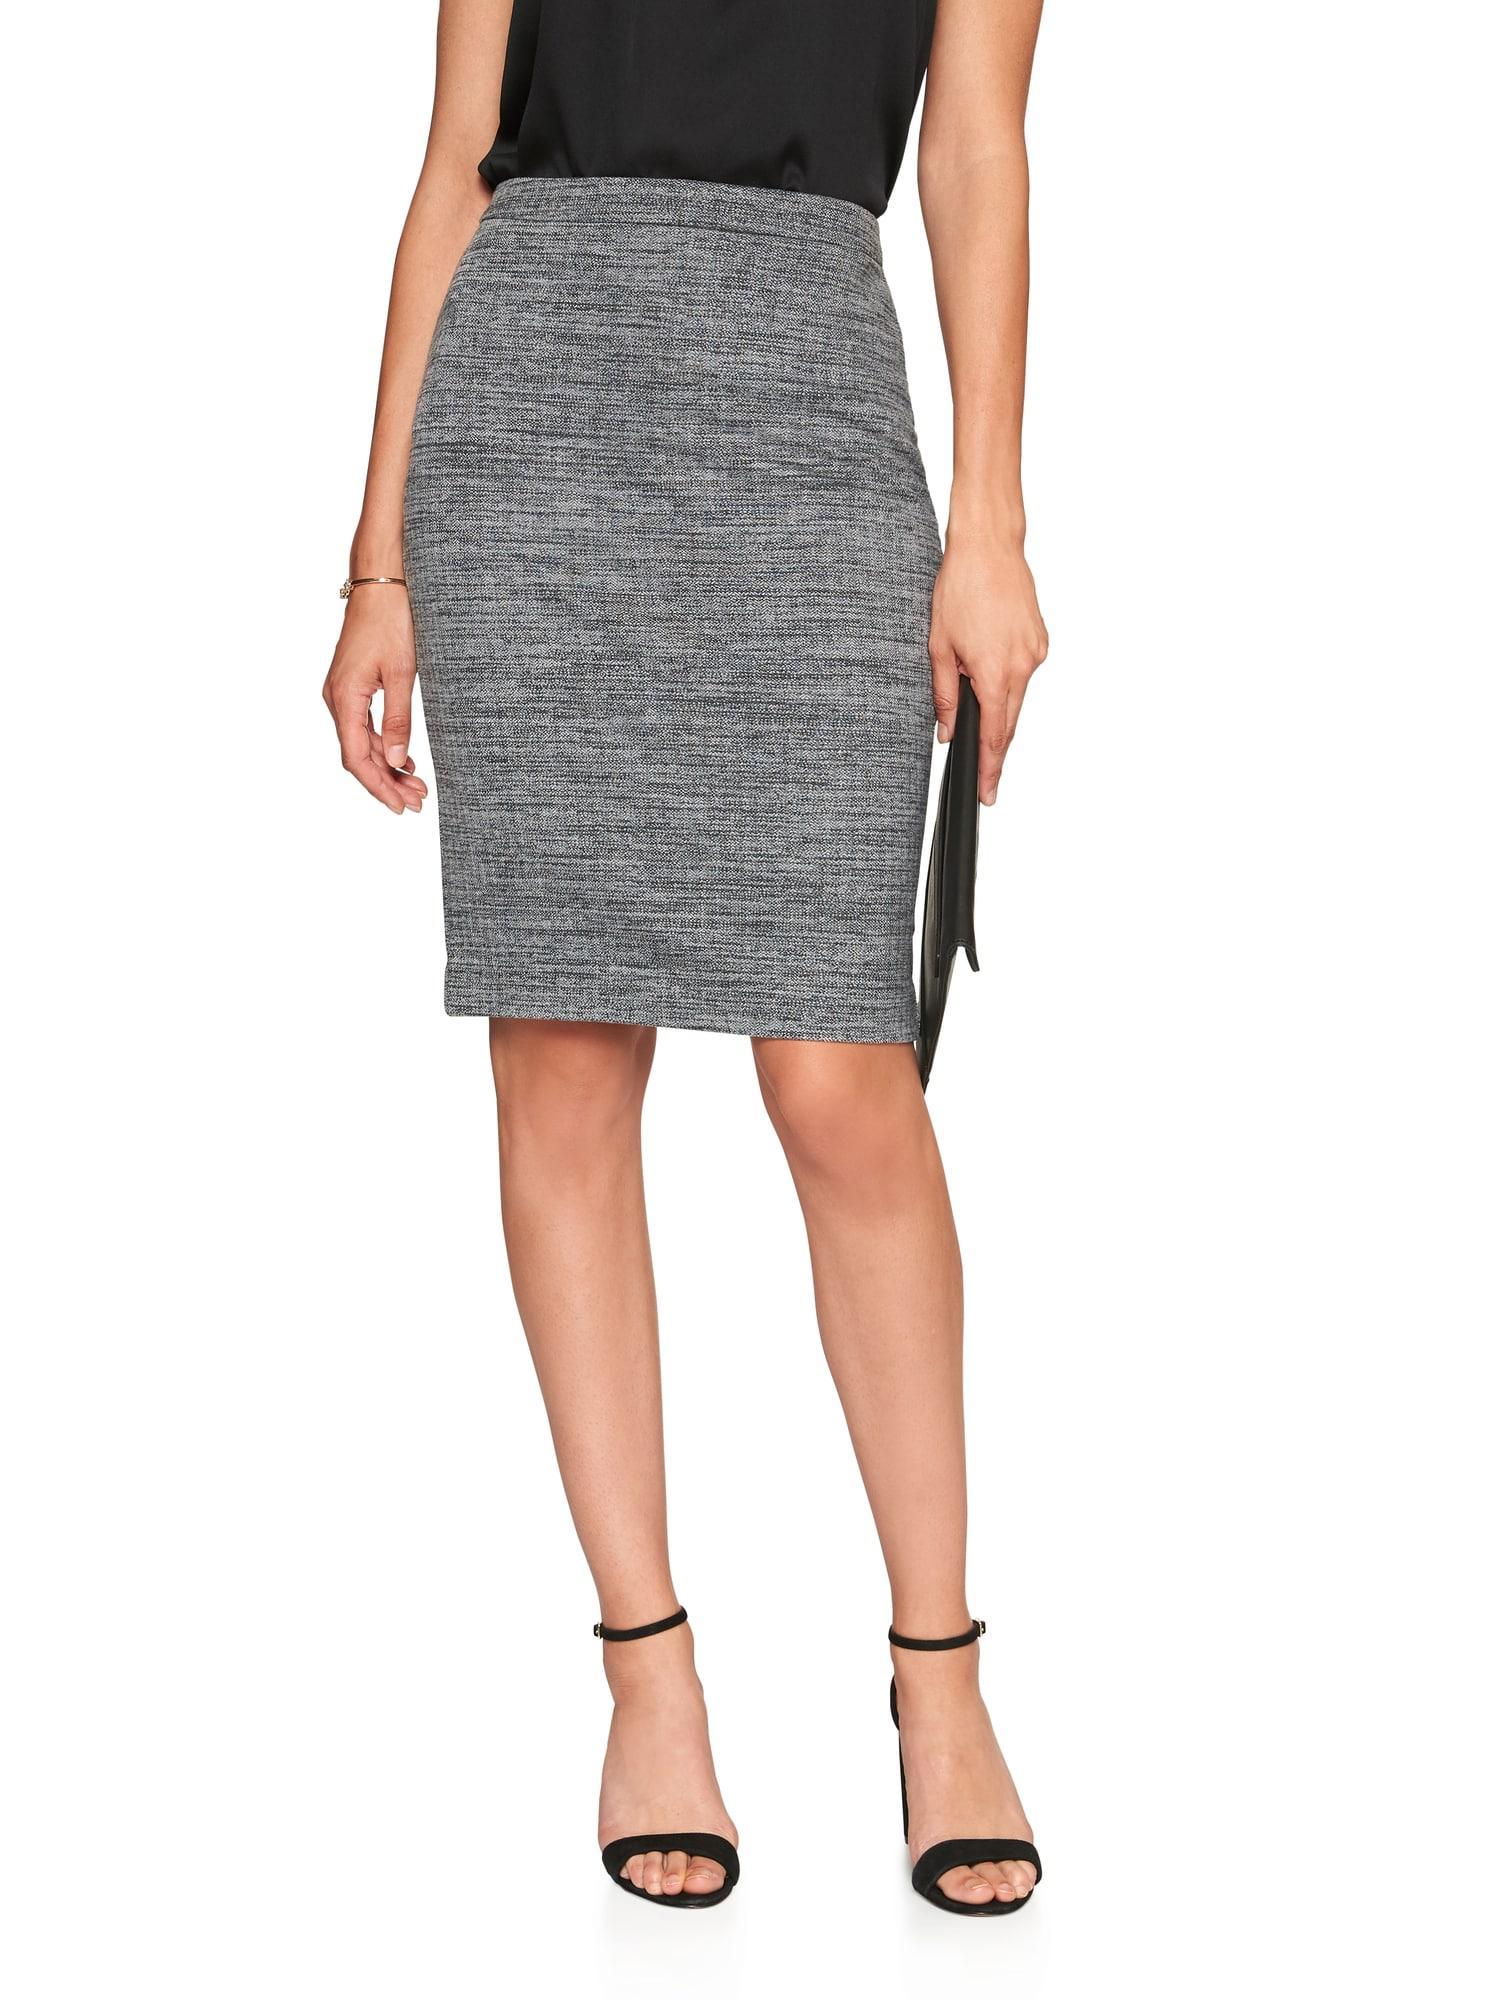 3909b7878913da Tweed Pencil Skirts Uk – DACC